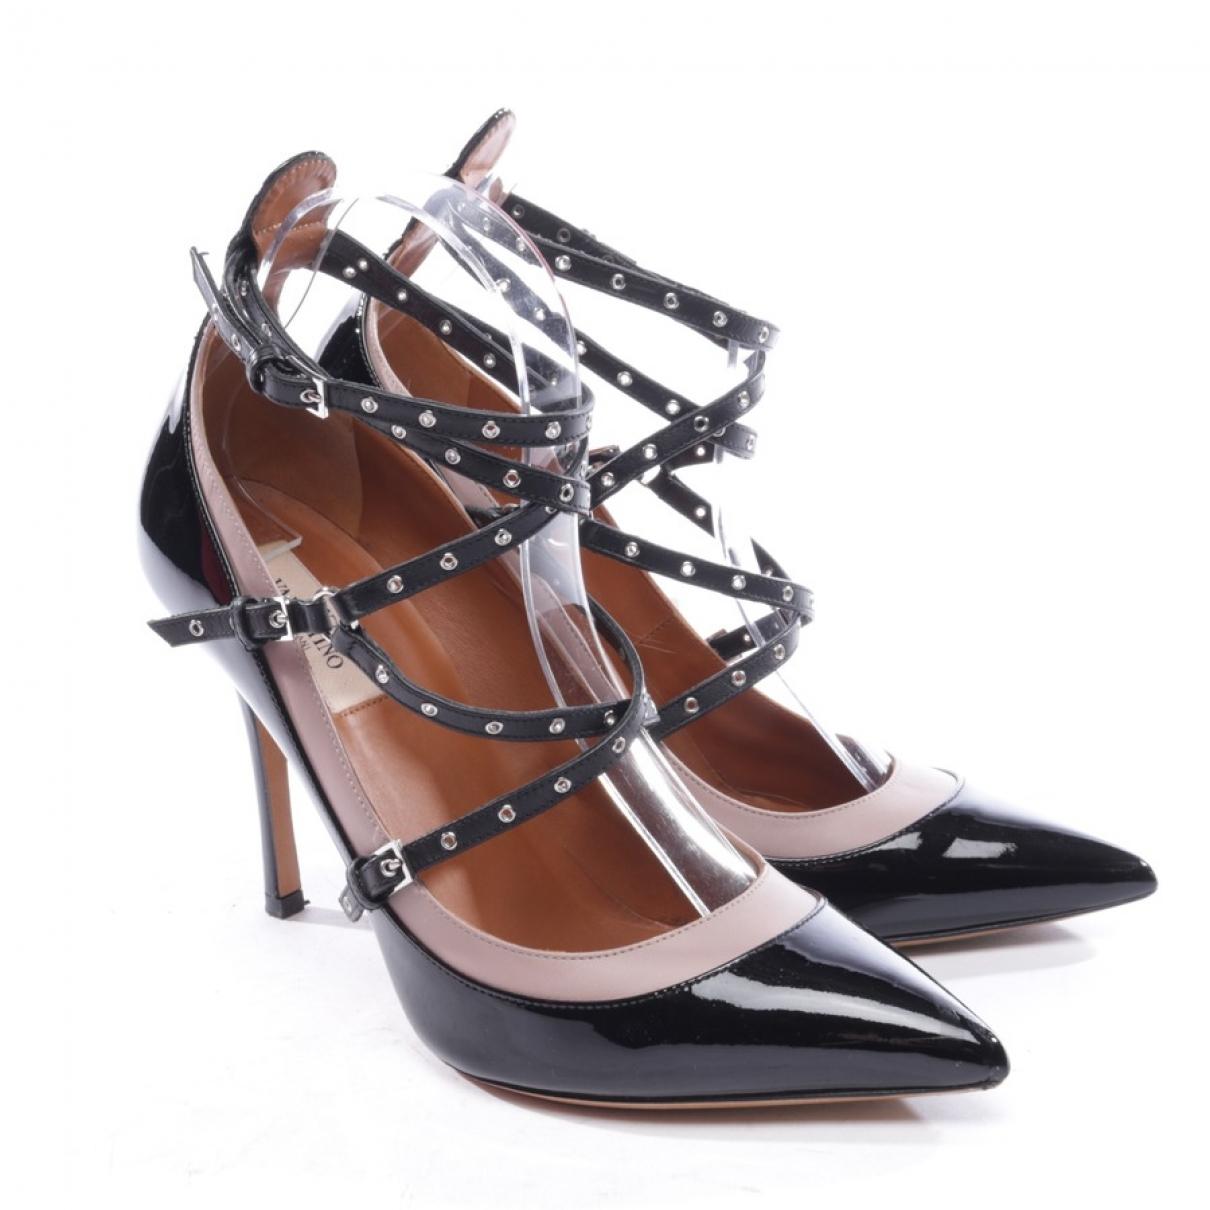 Valentino Garavani \N Black Patent leather Heels for Women 39.5 EU